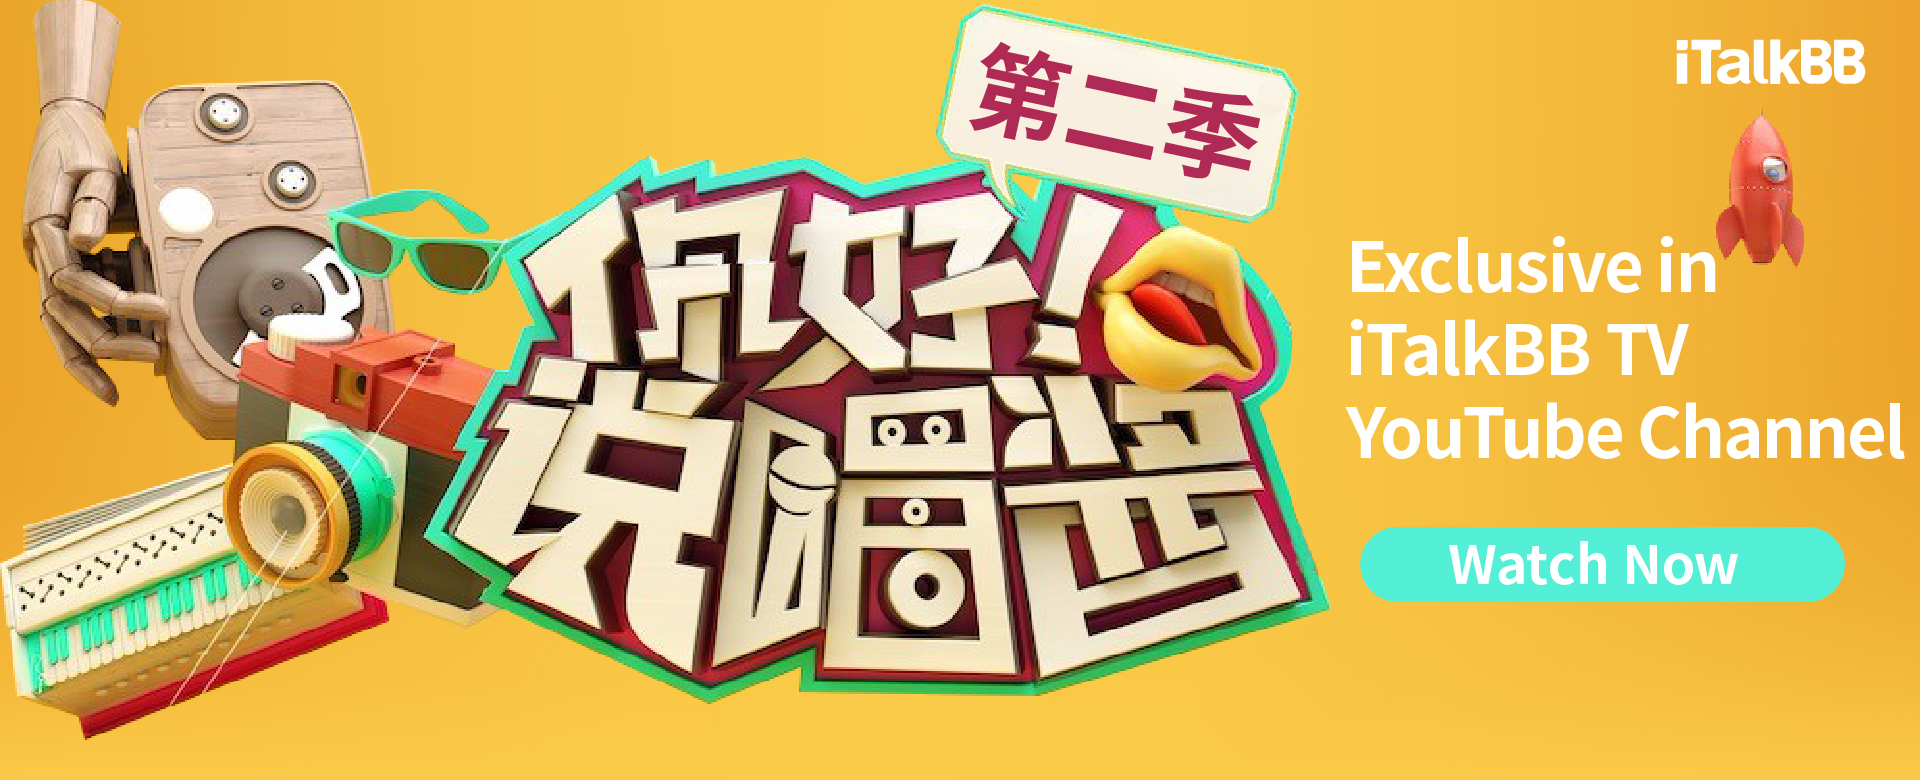 iTalkBB Chinese TV-Plans